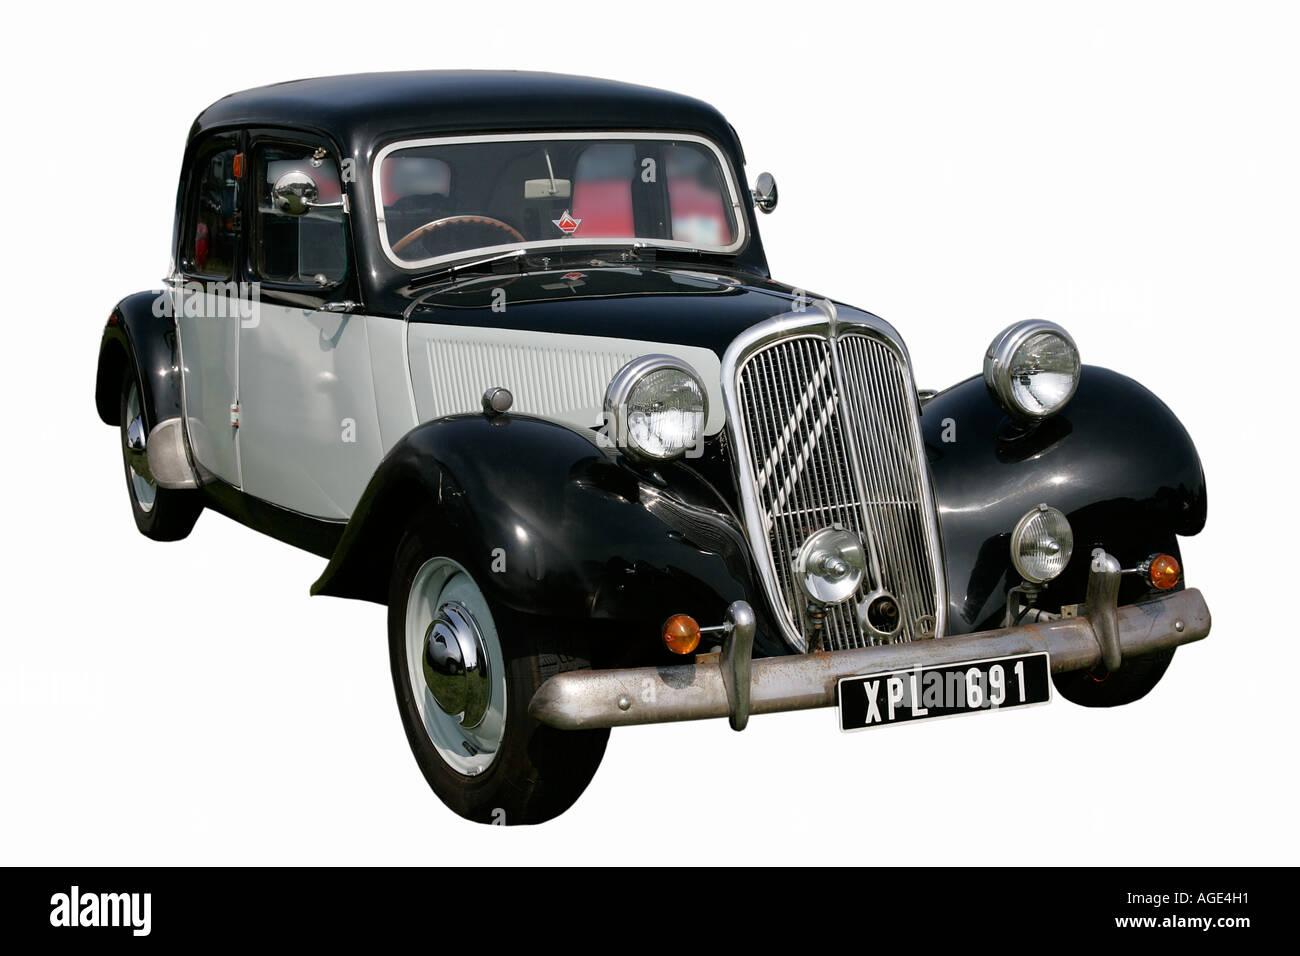 classic car Citroen old history vehicle vintage antipodes symbol ...